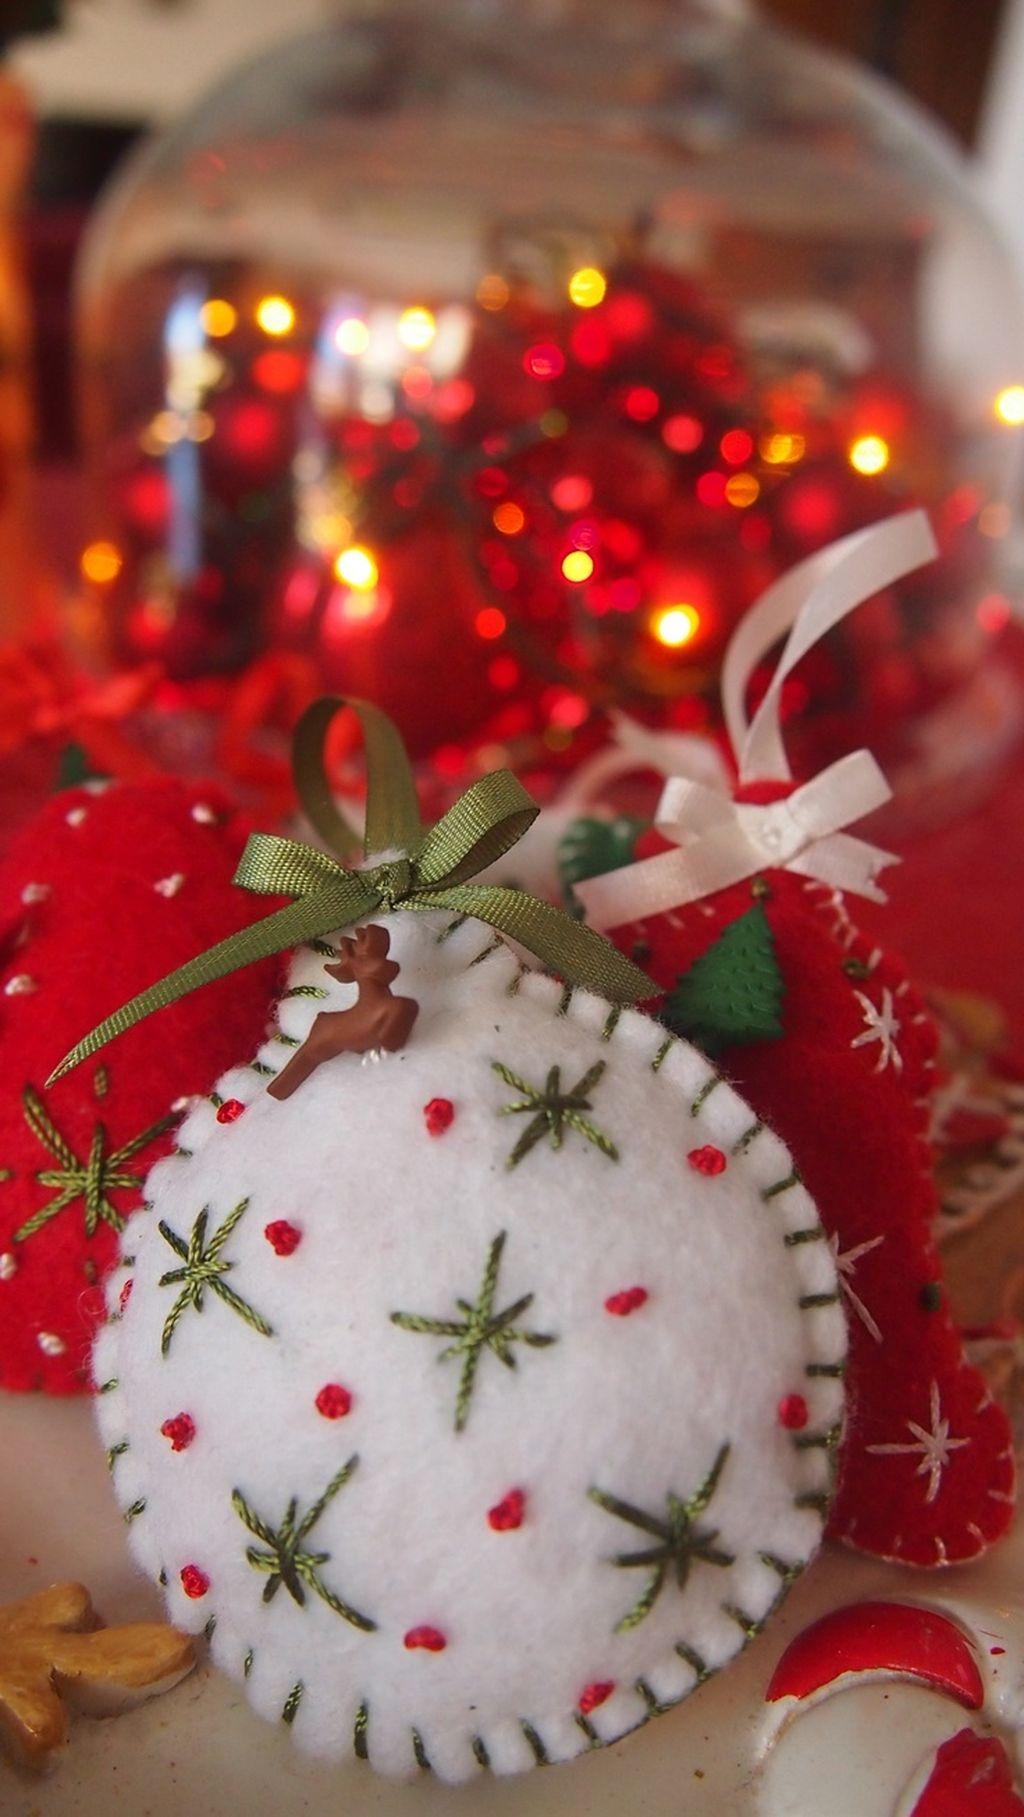 39 Brilliant Ideas How To Use Felt Ornaments For Christmas Tree Decoration 01